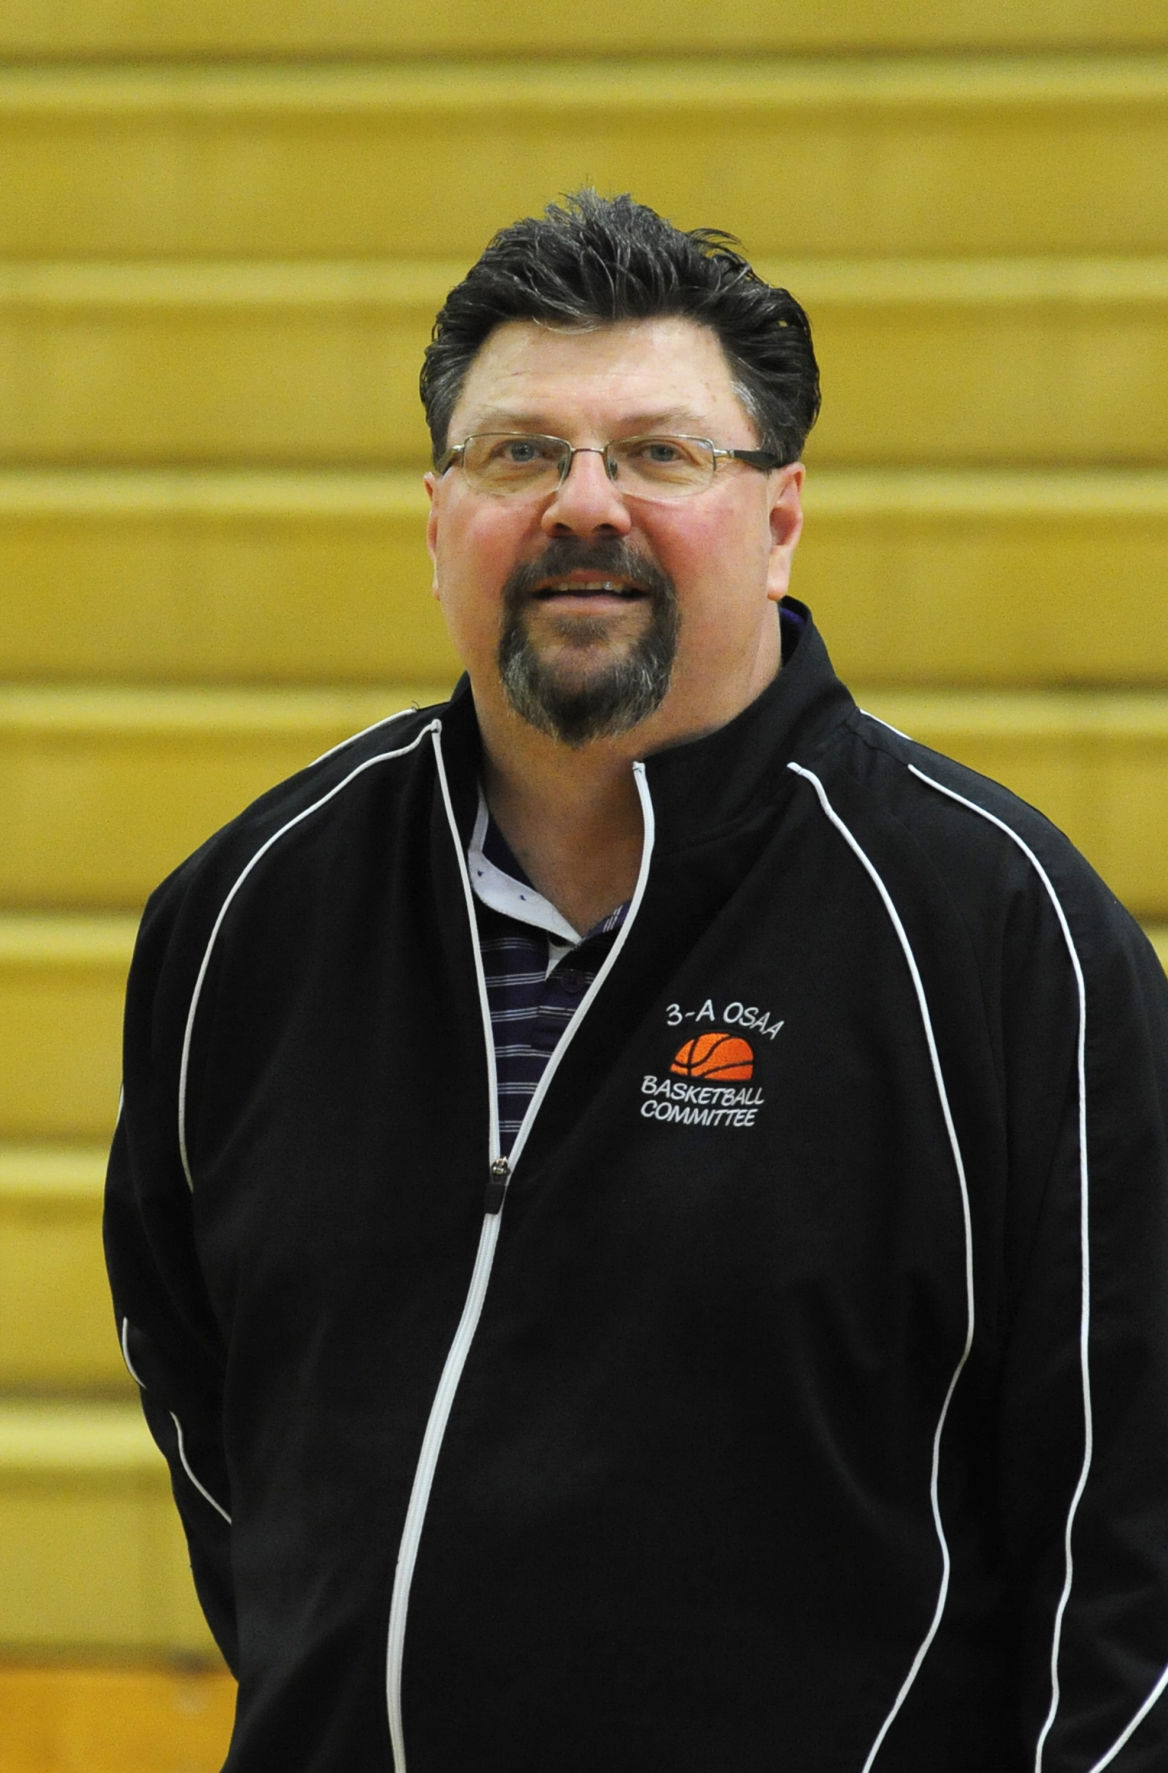 Marshfield Athletic Director